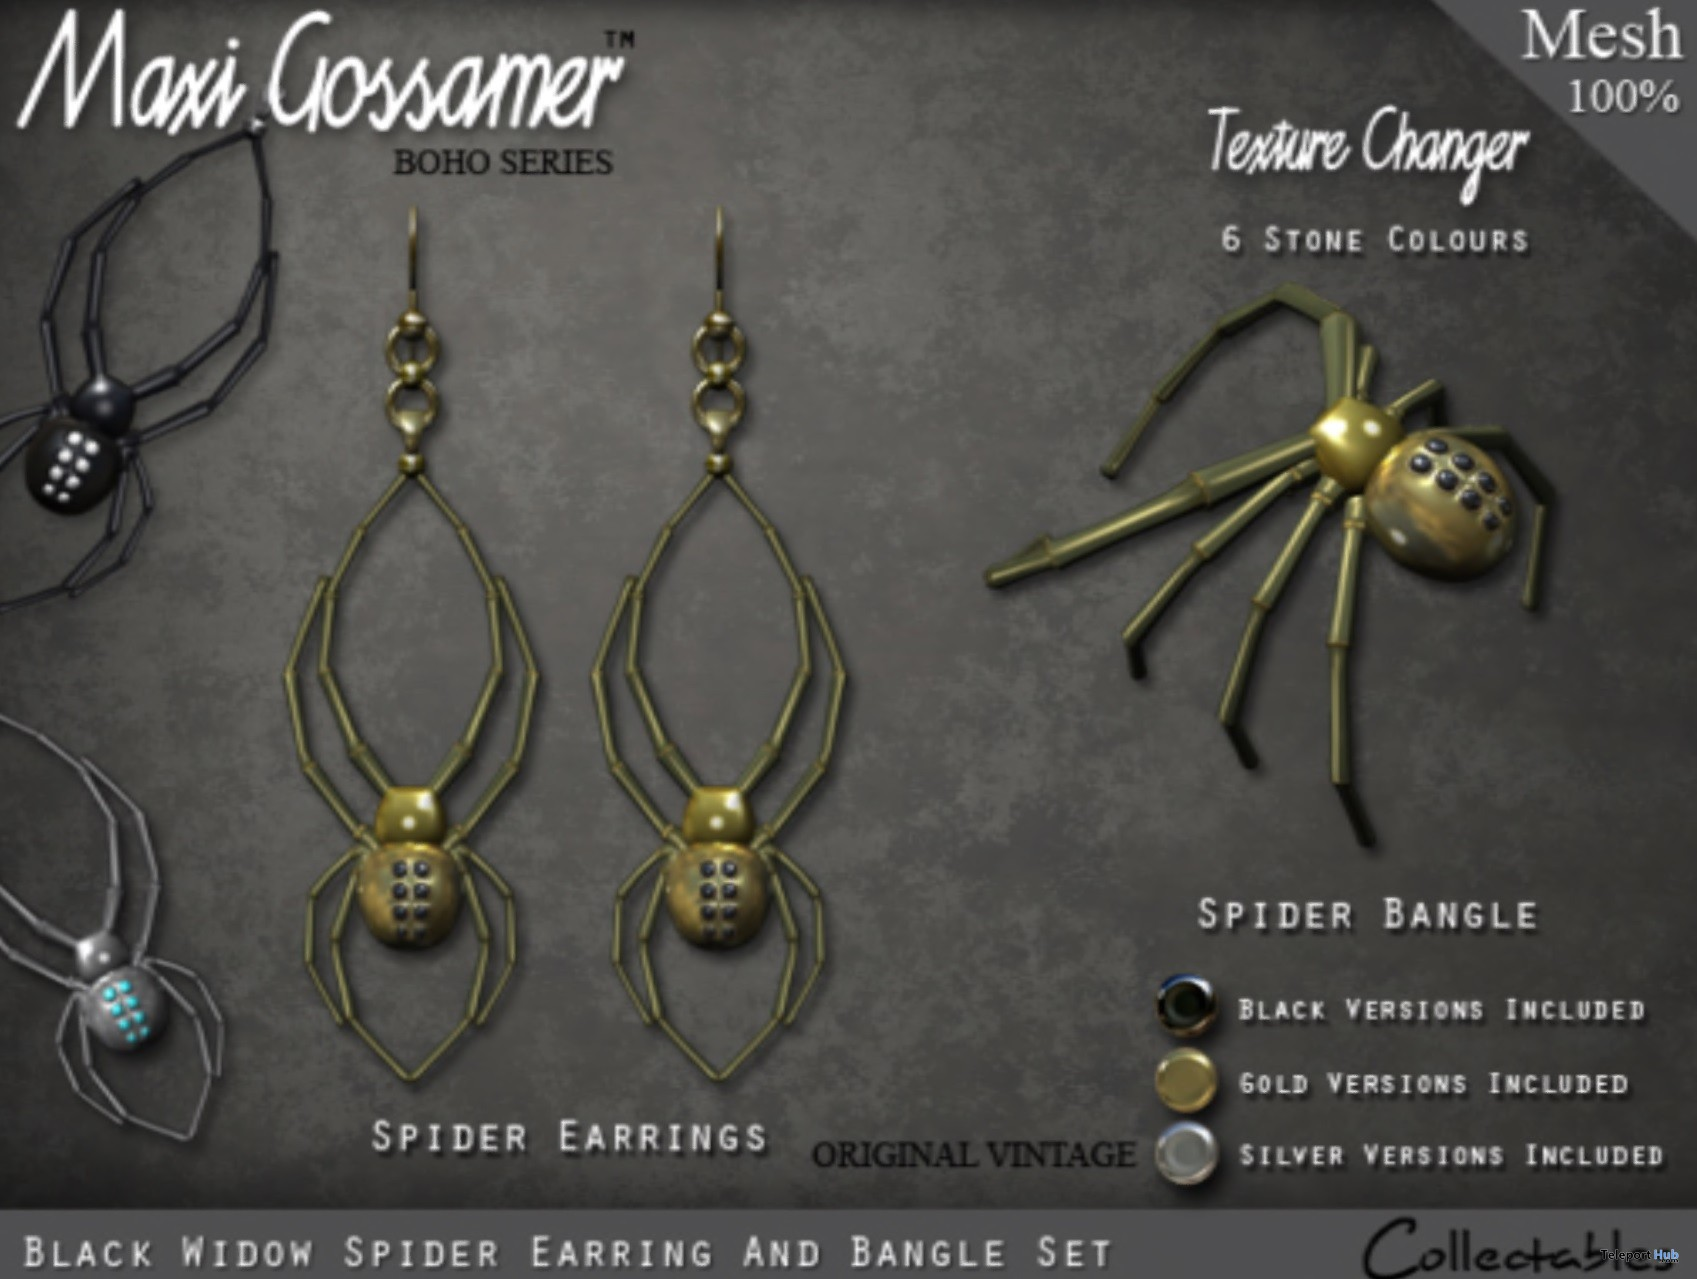 Black Widow Spider Earrings & Bangle Set Group Gift by Maxi Gossamer - Teleport Hub - teleporthub.com